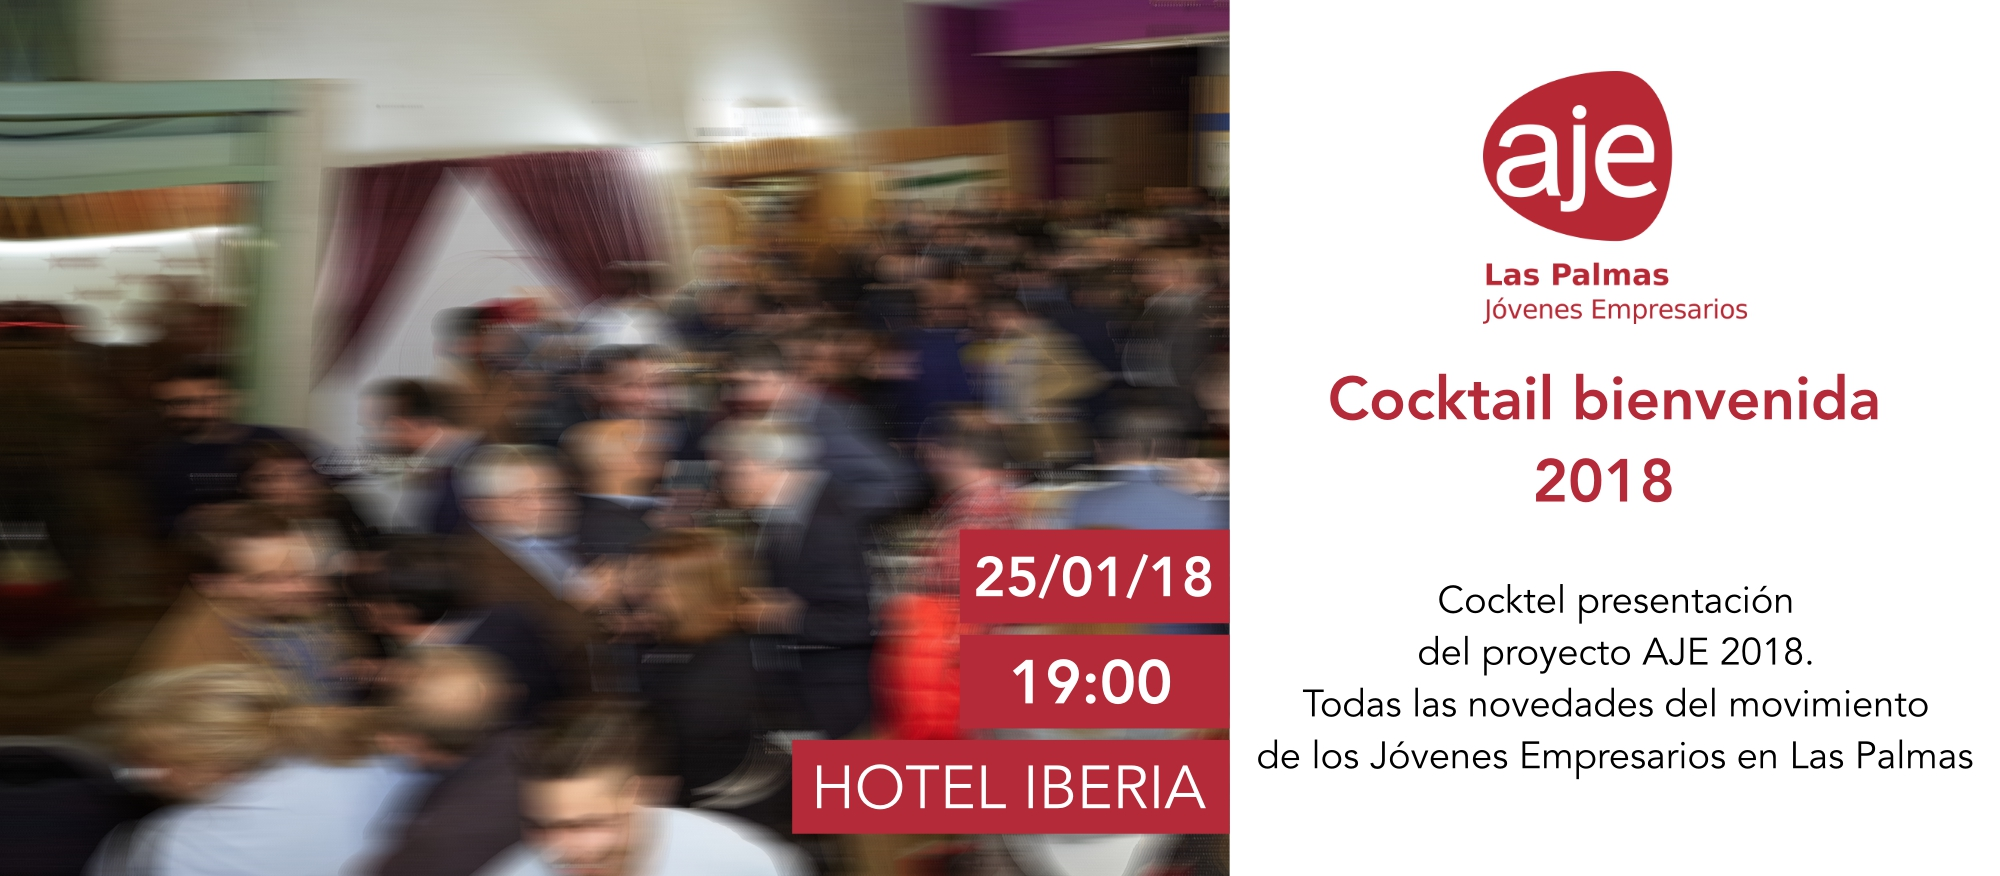 Cocktail bienvenida 2018 AJE Las Palmas